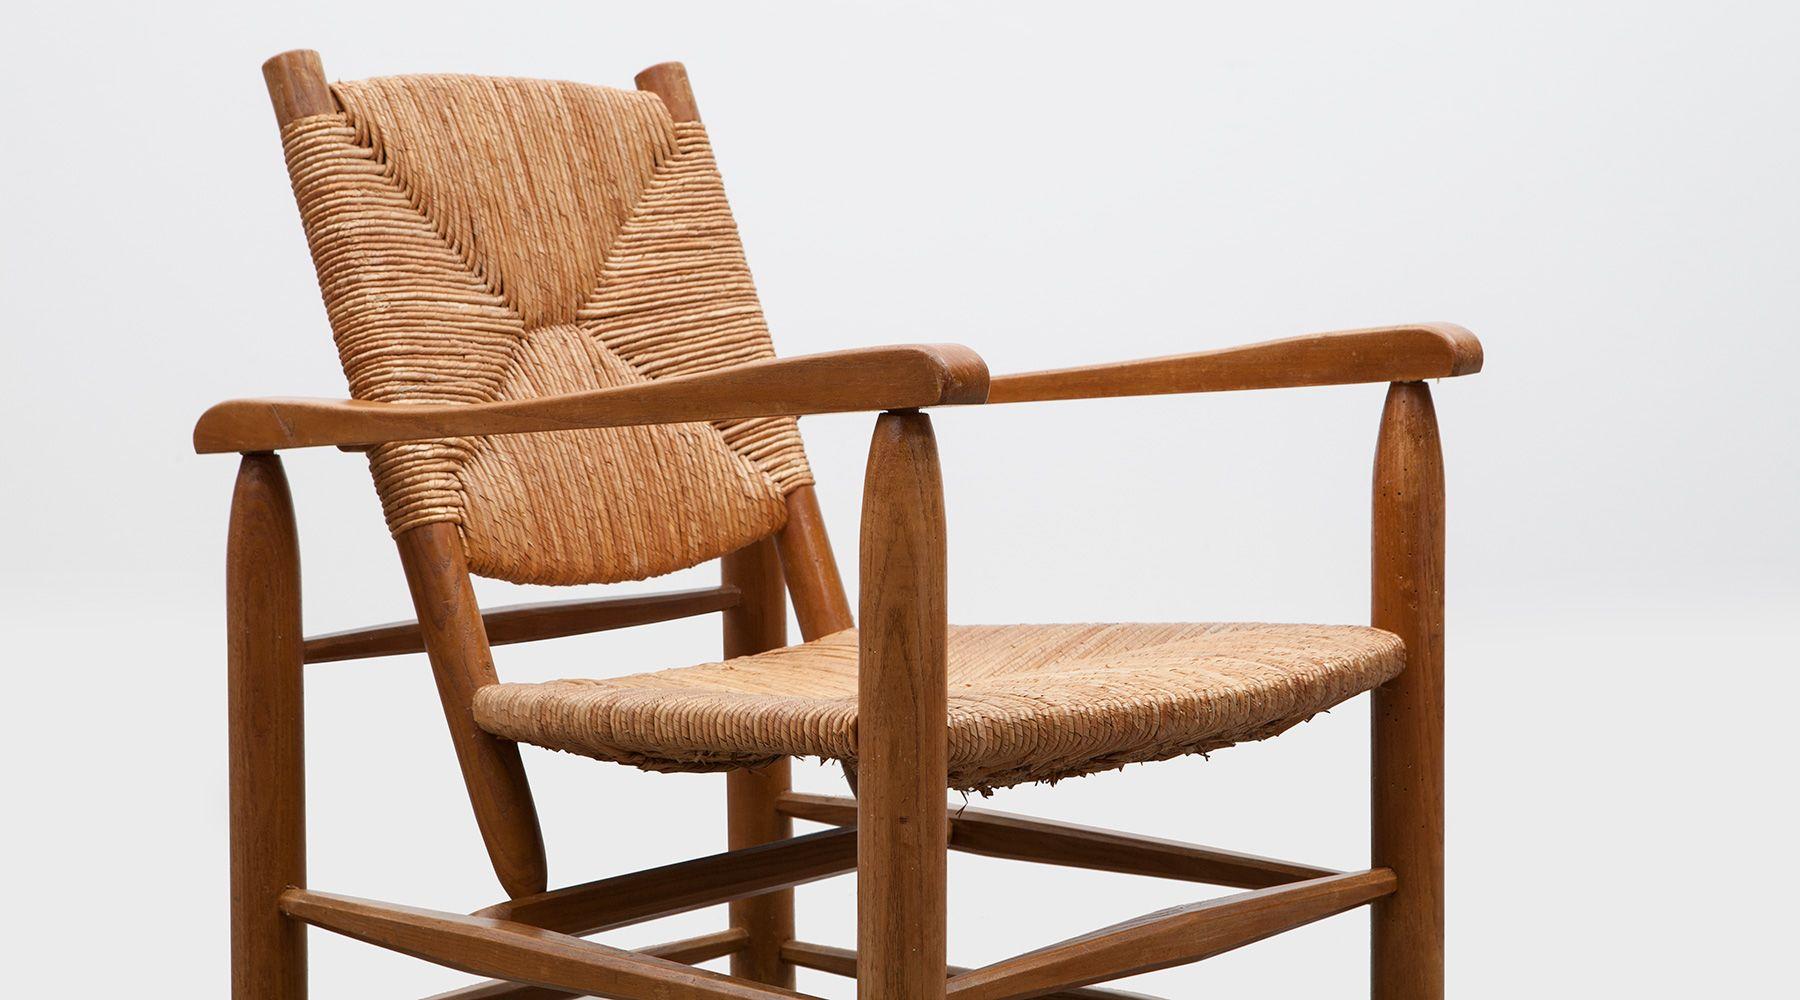 Pleasant Lounge Chairs 2 By Charlotte Perriand Frank Landau Inzonedesignstudio Interior Chair Design Inzonedesignstudiocom